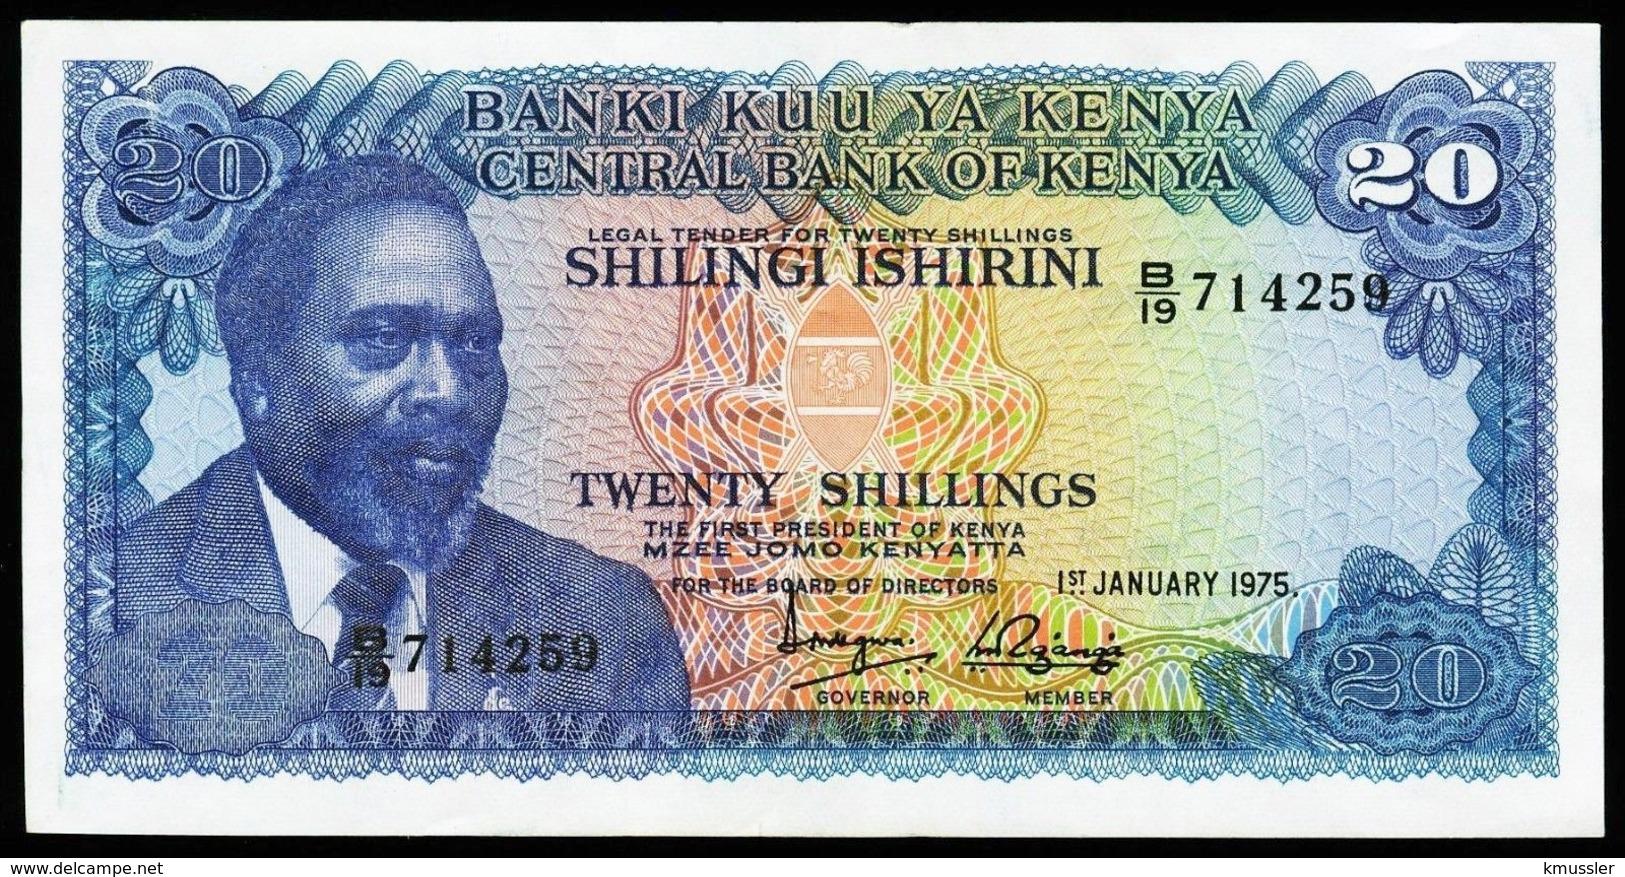 # # # Banknote Kenia (Kenya) 20 Schillingi 1975 AU+ # # # - Kenya